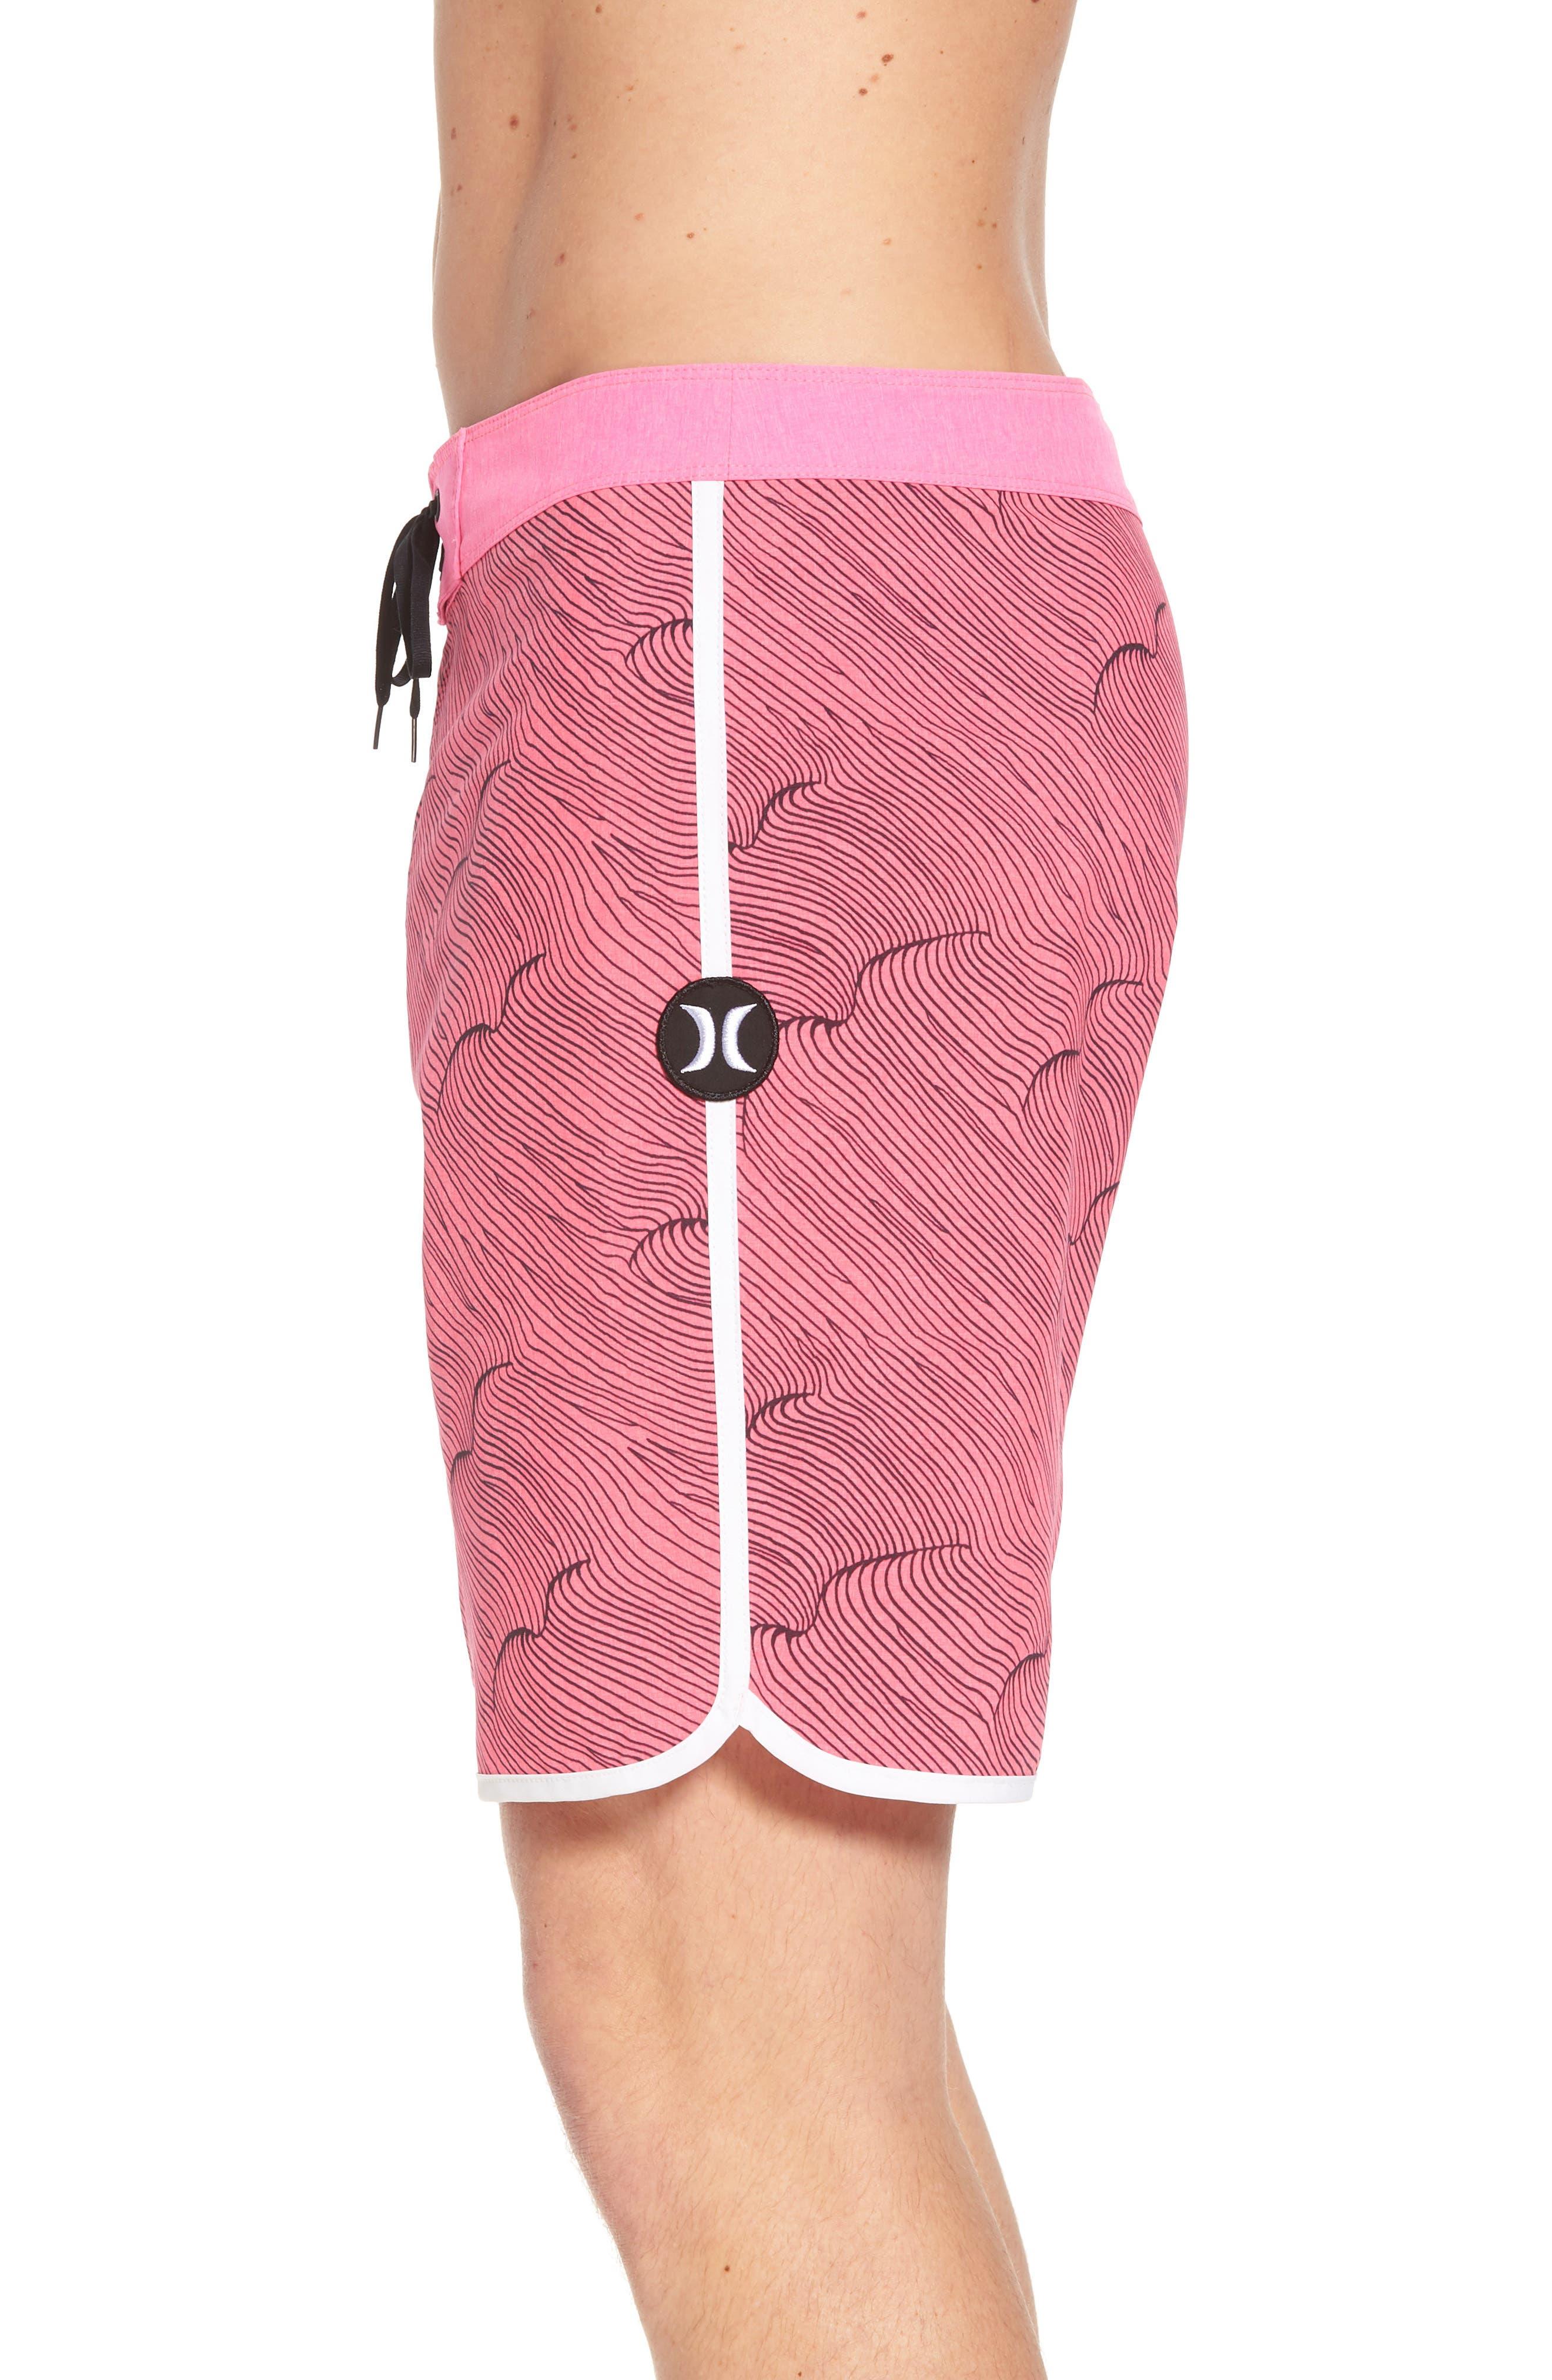 Phantom Thalia Street Board Shorts,                             Alternate thumbnail 4, color,                             Hyper Pink/Black